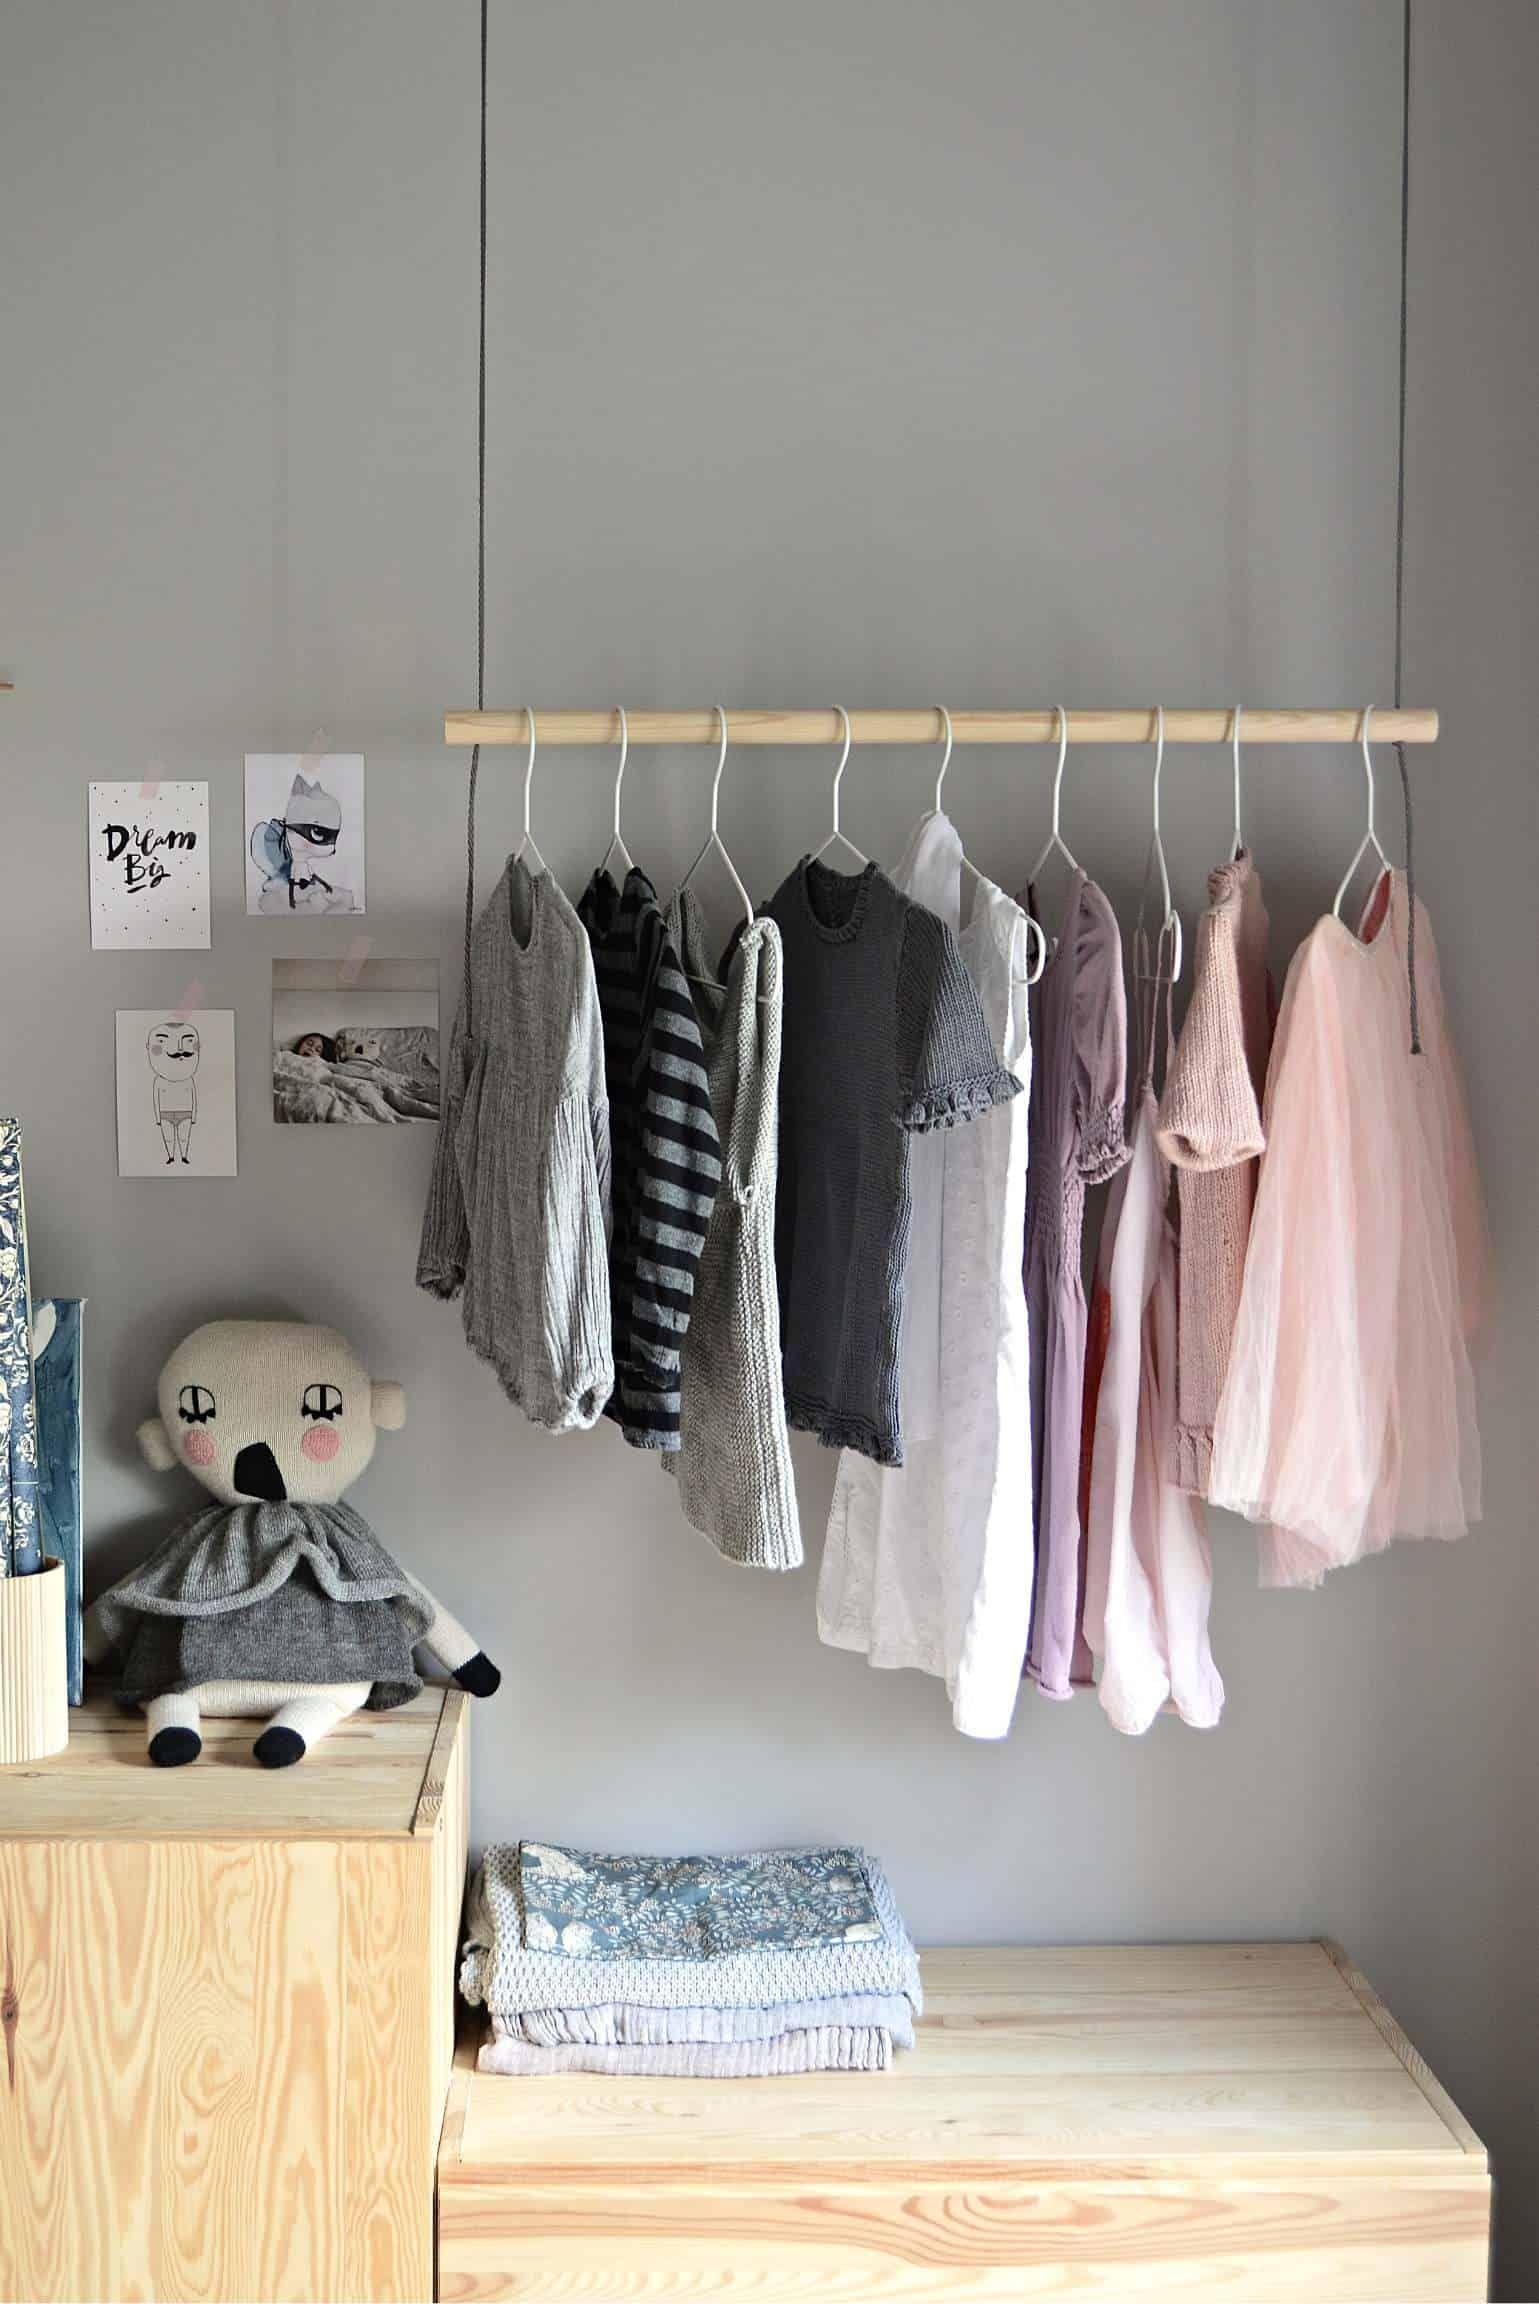 22 DIY Clothes Racks in 2020 Organize Your Closet